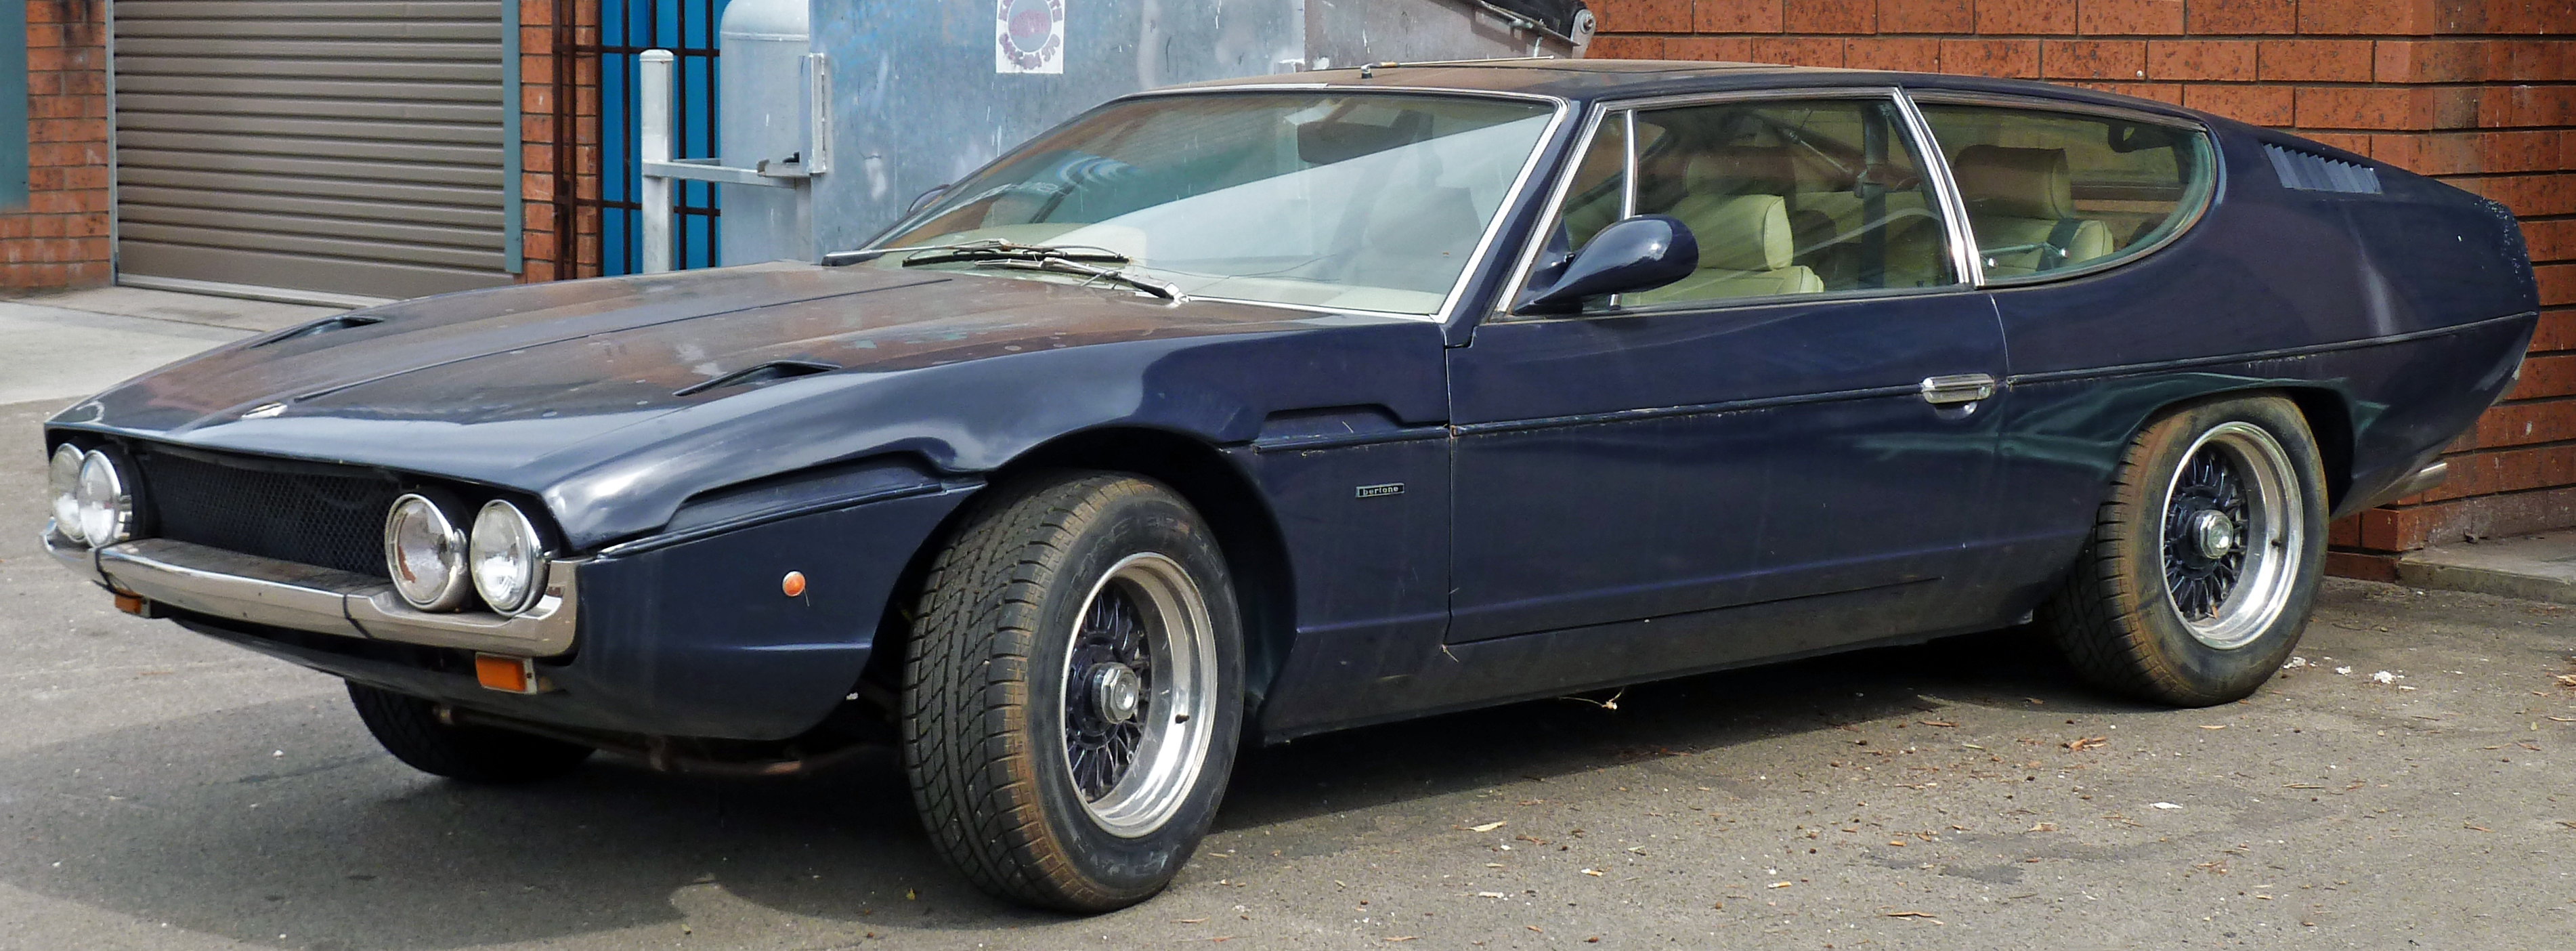 https://upload.wikimedia.org/wikipedia/commons/f/f0/1968-1978_Lamborghini_Espada_coupe_01.jpg